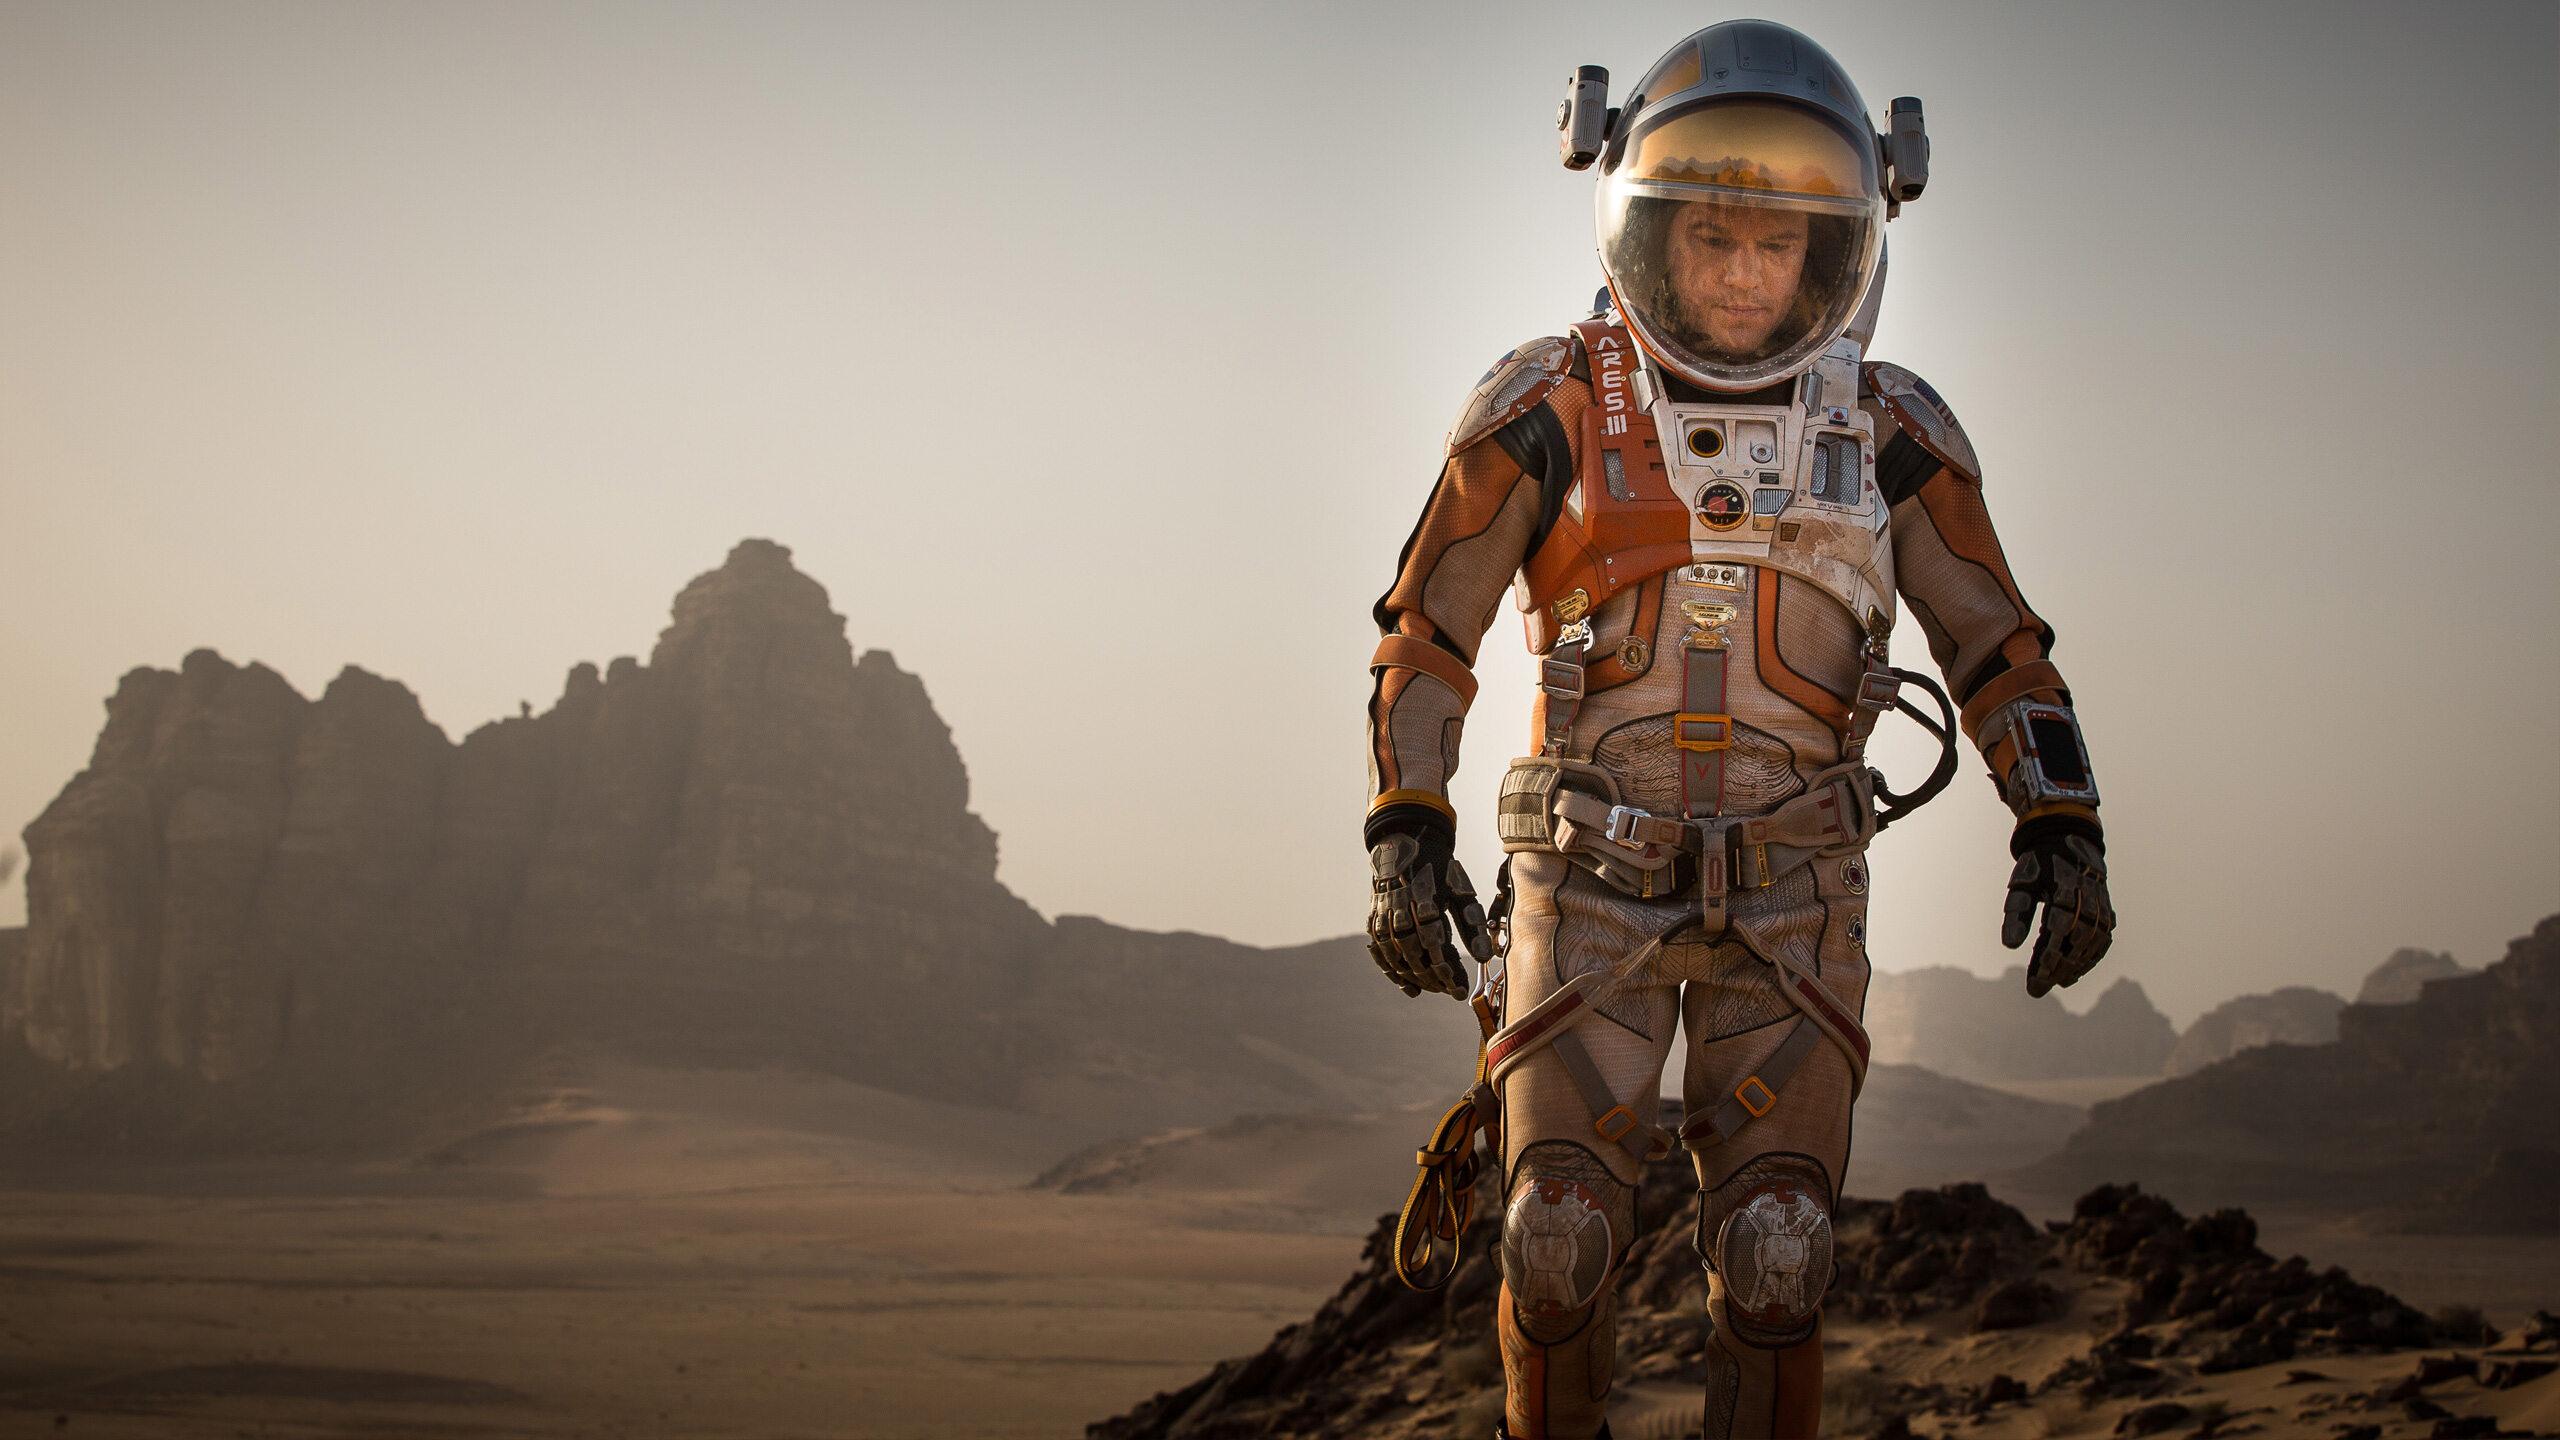 Matt Damon w filmie Marsjanin / The Martian (2015)